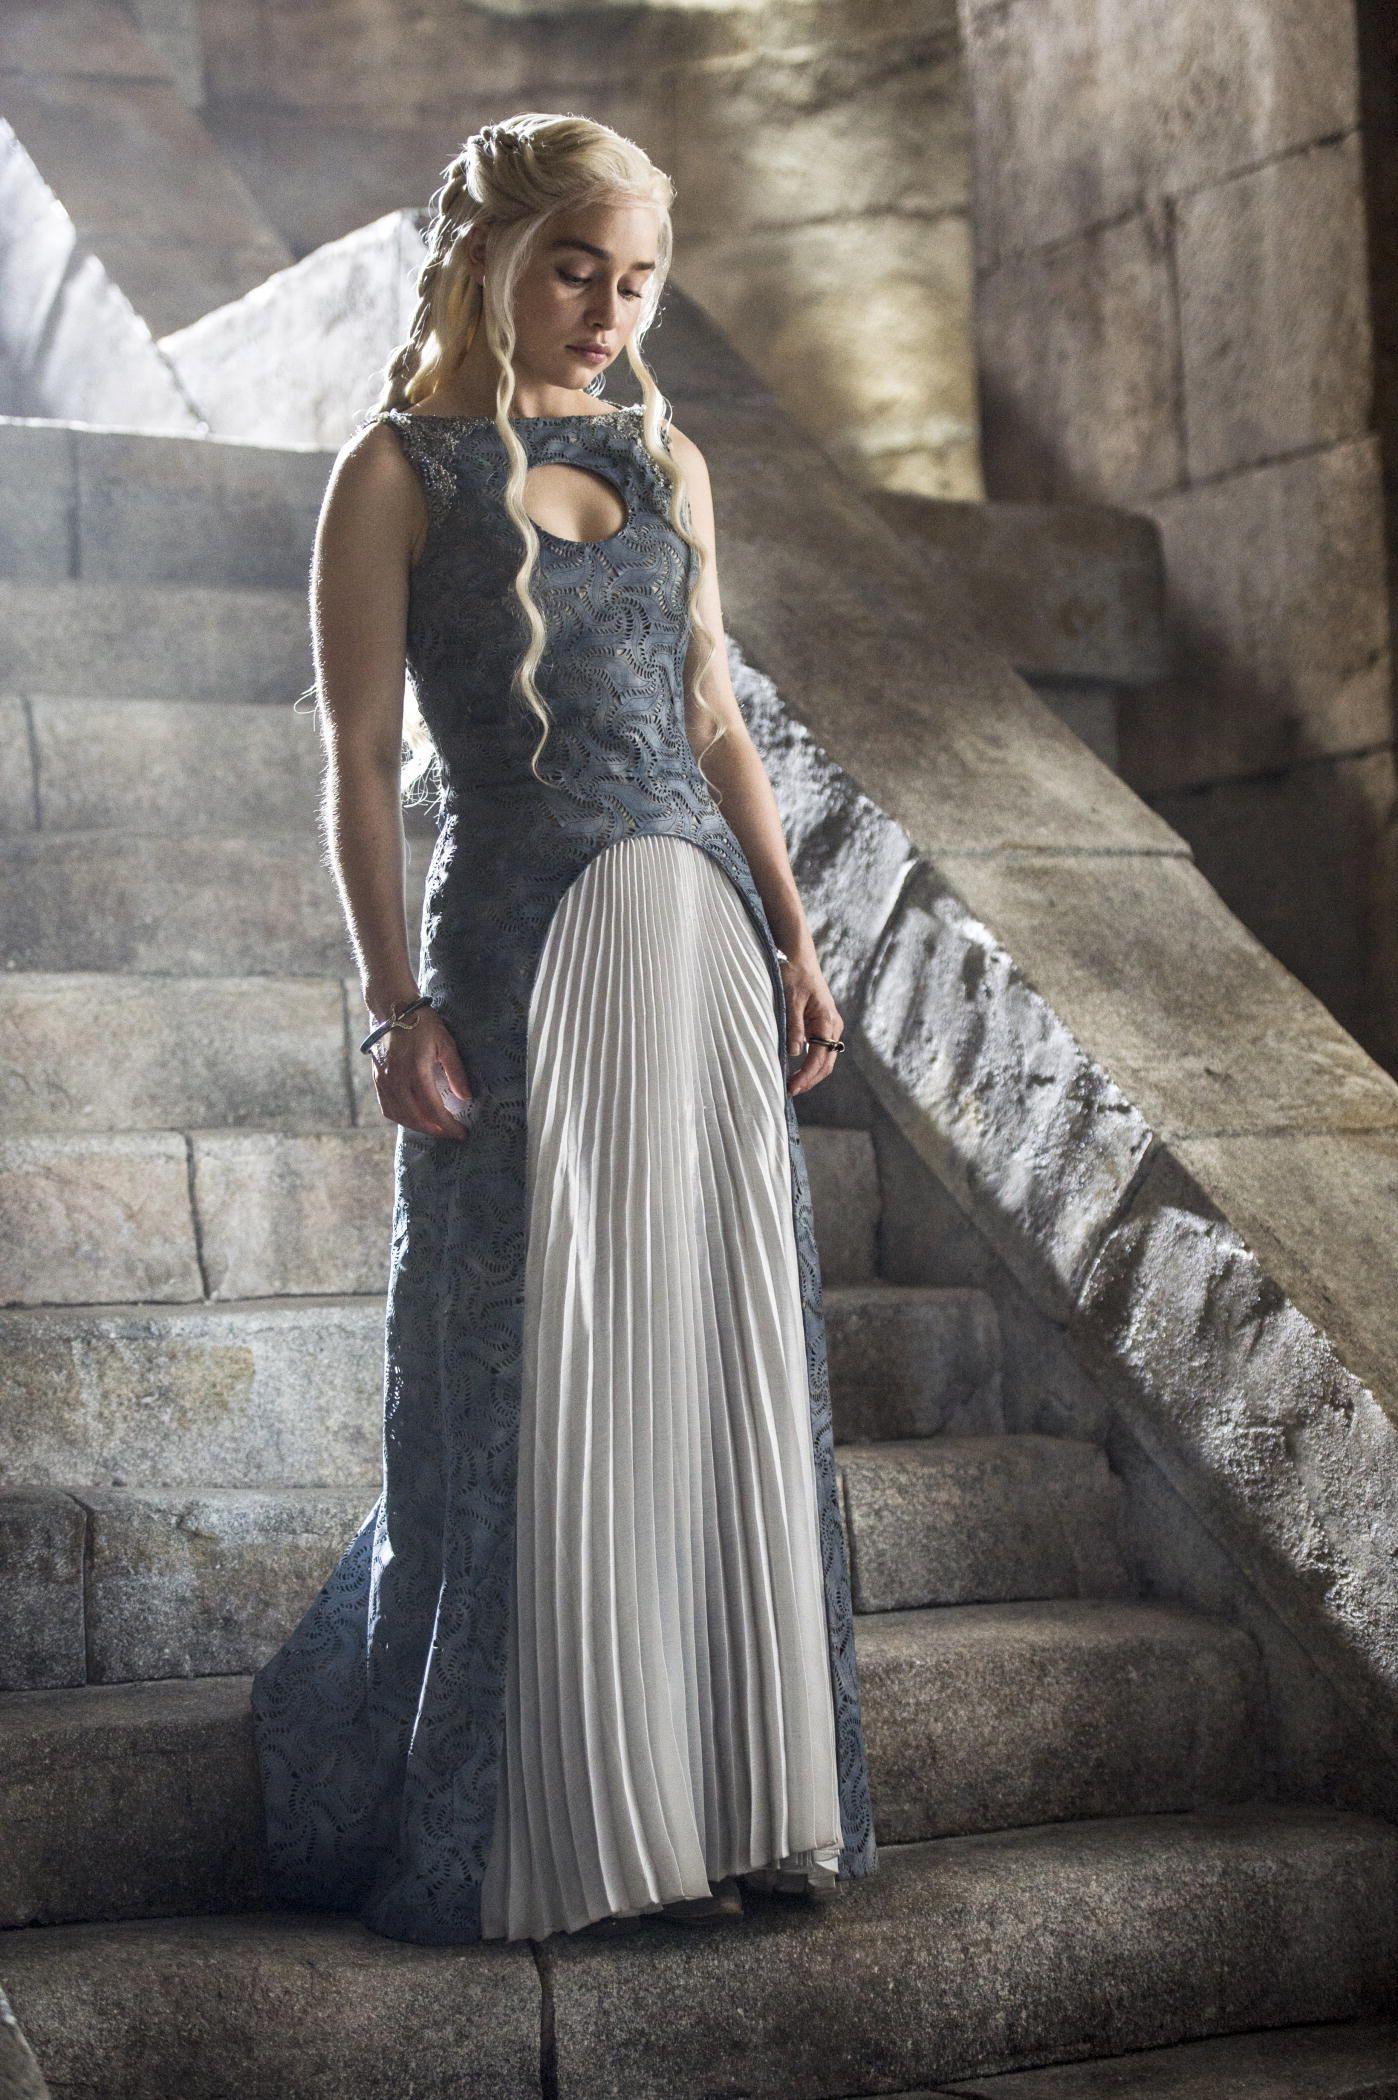 Game of Thrones - Season 4 Episode 10 Still | Kostým | Pinterest ...